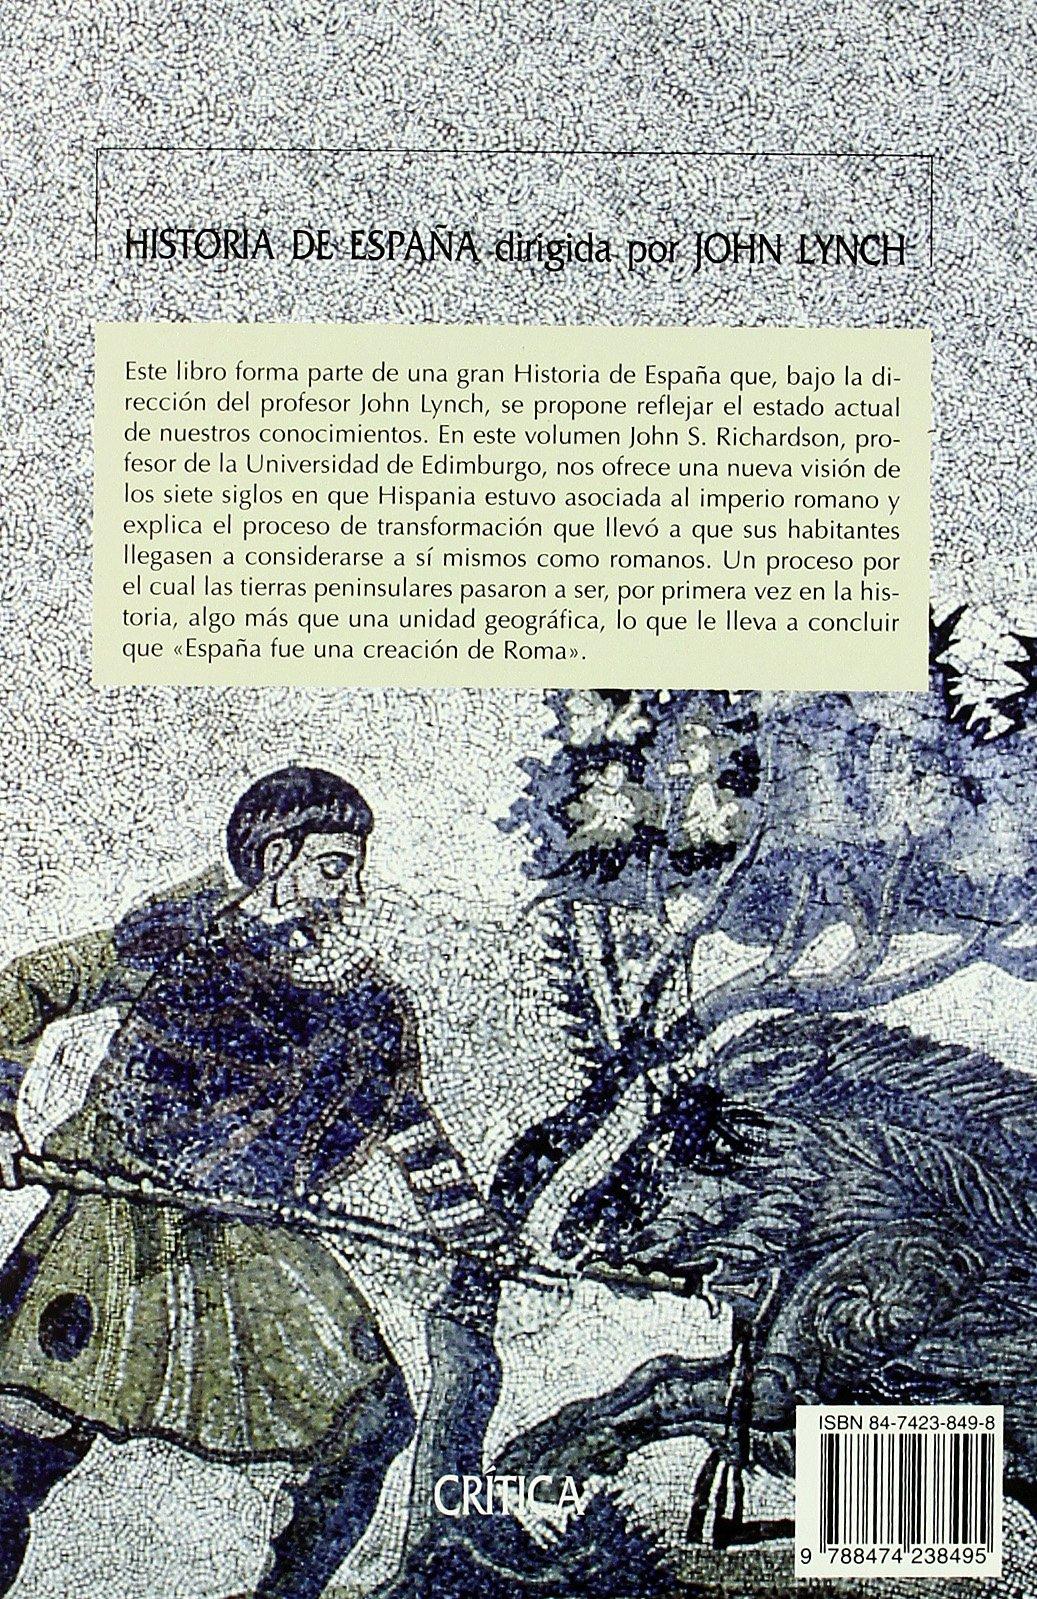 Hispania y los romanos (Serie Mayor): Amazon.es: Richardson, John S.: Libros